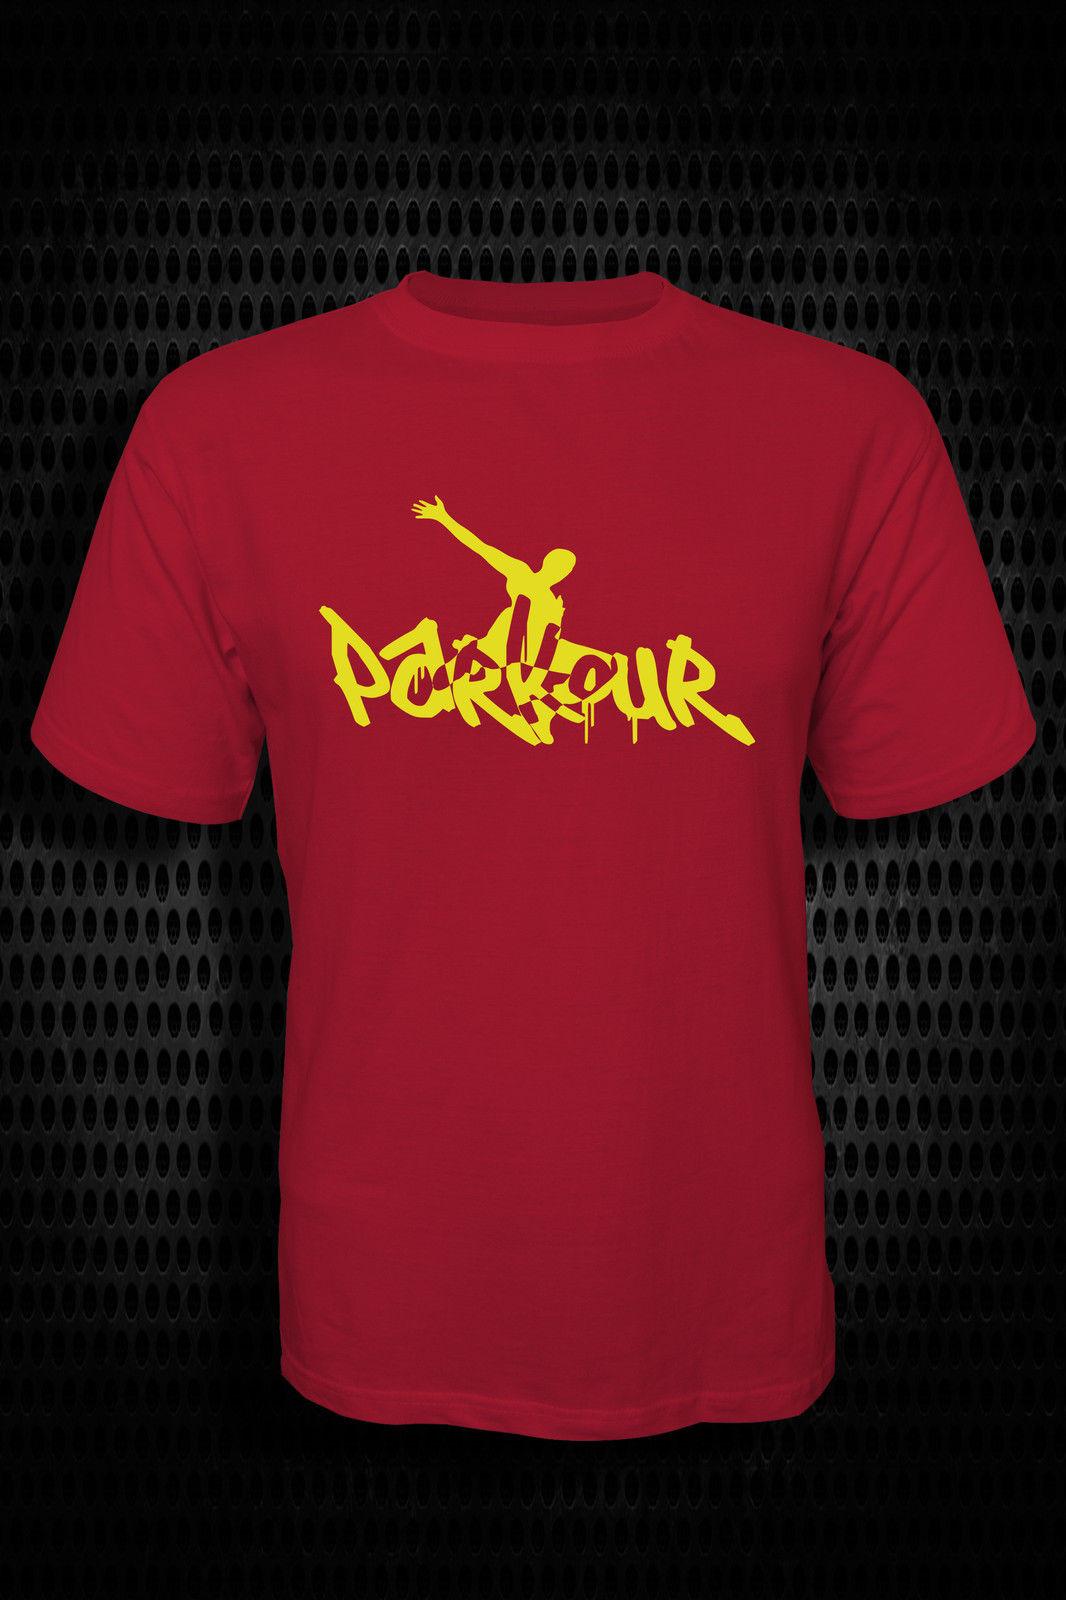 Se pudra Parkour Klettern Frei Laufen Schwingend surgido urbano Herren Casual más tamaño camisetas estilo Hip Hop Tops Tee S-2Xl T camisas